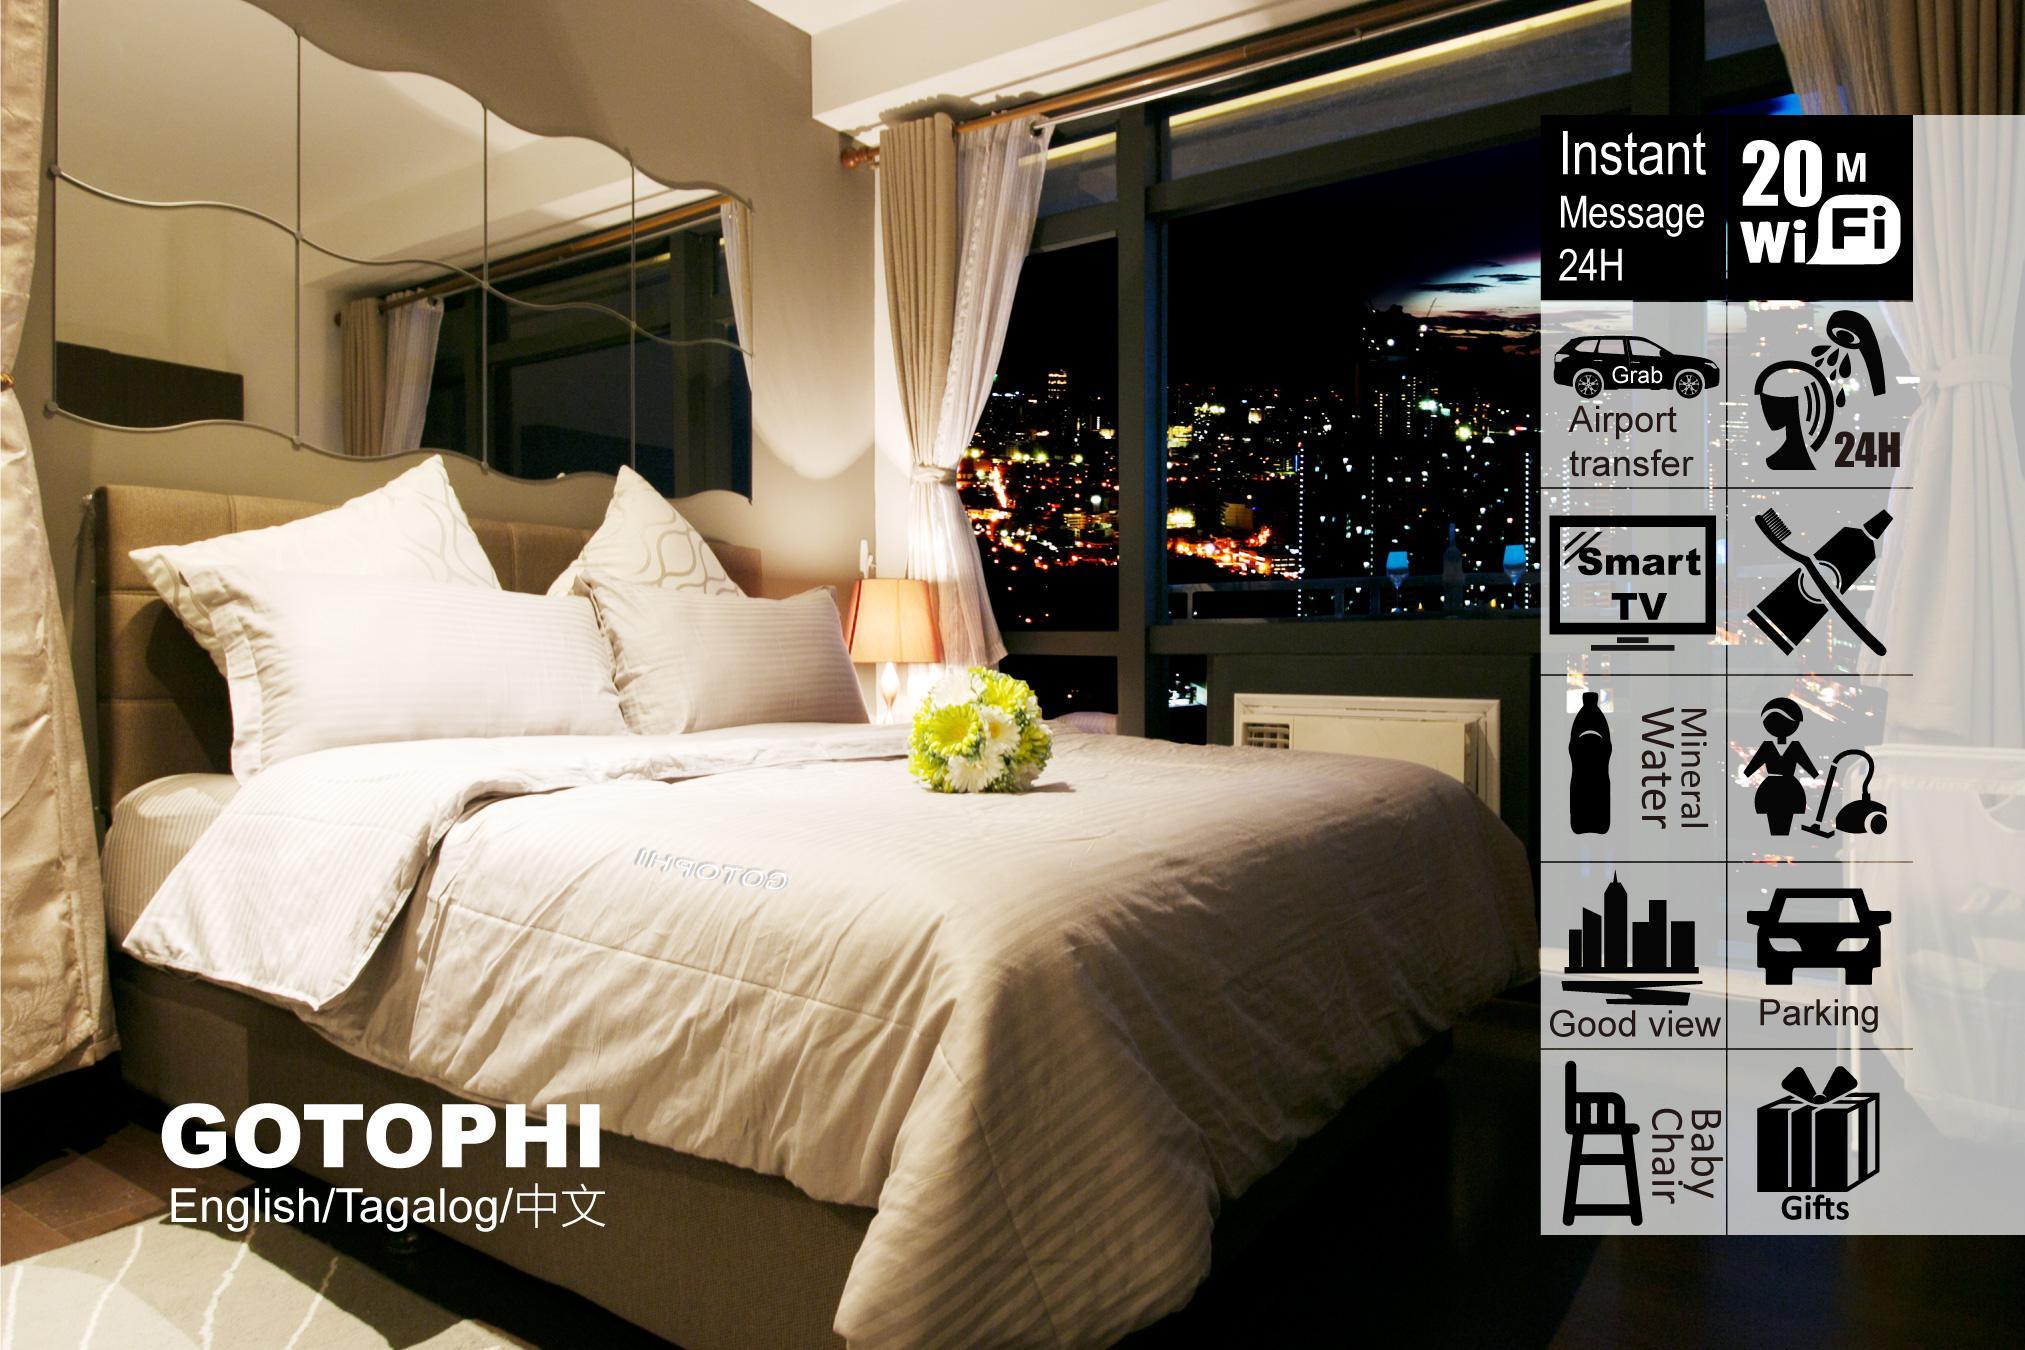 Gotophi Luxurious 5Star Hotel Gramercy Makati 5107